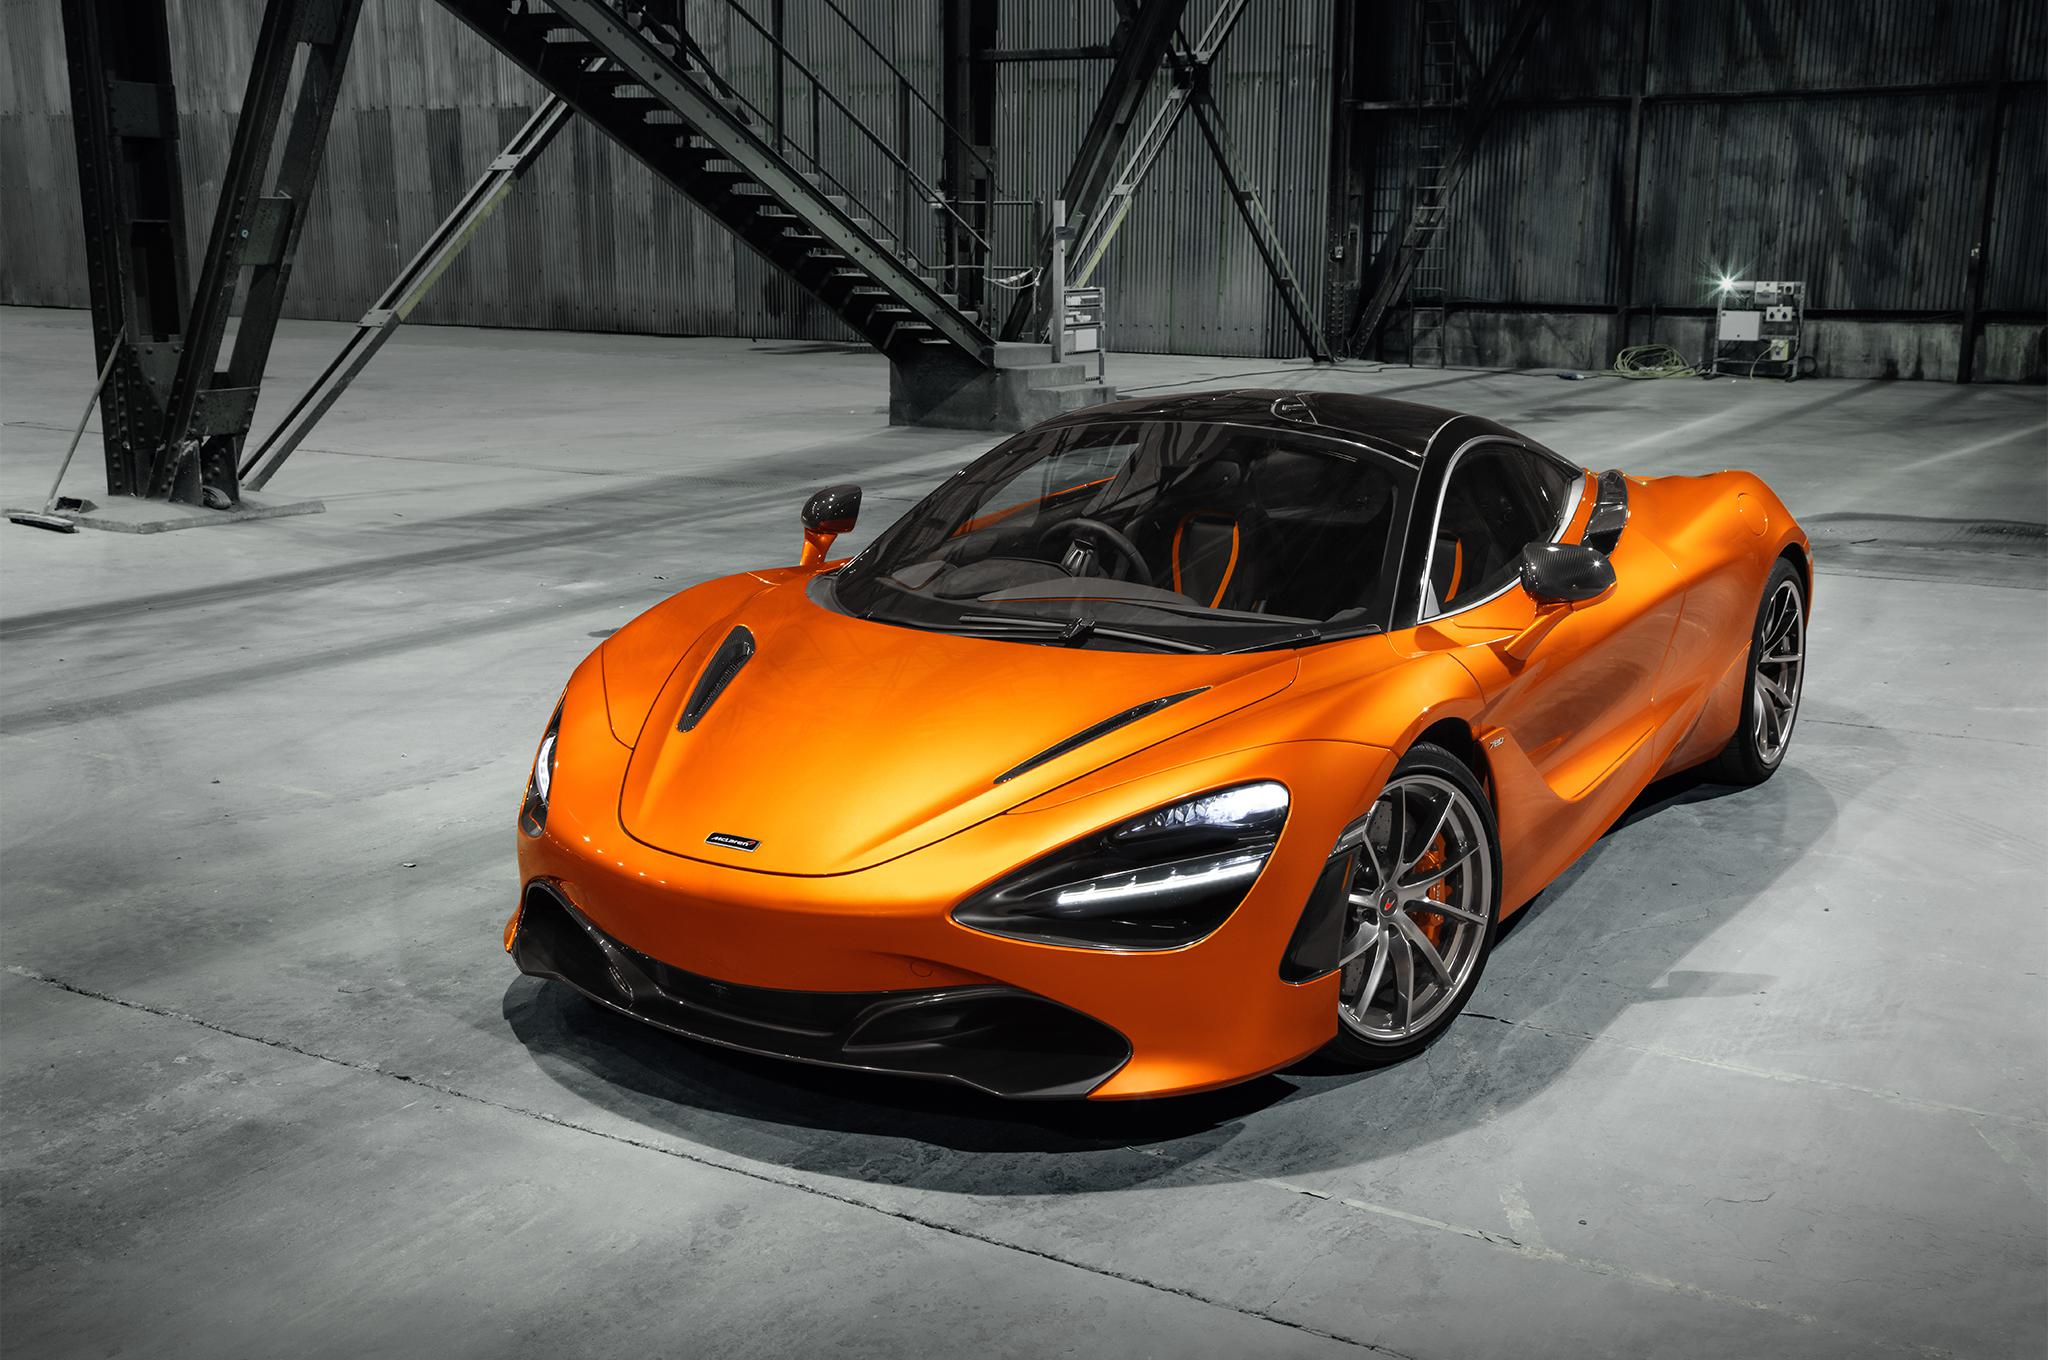 2018 McLaren 720S Price, Specs, Spy Shots, Interior, Engine